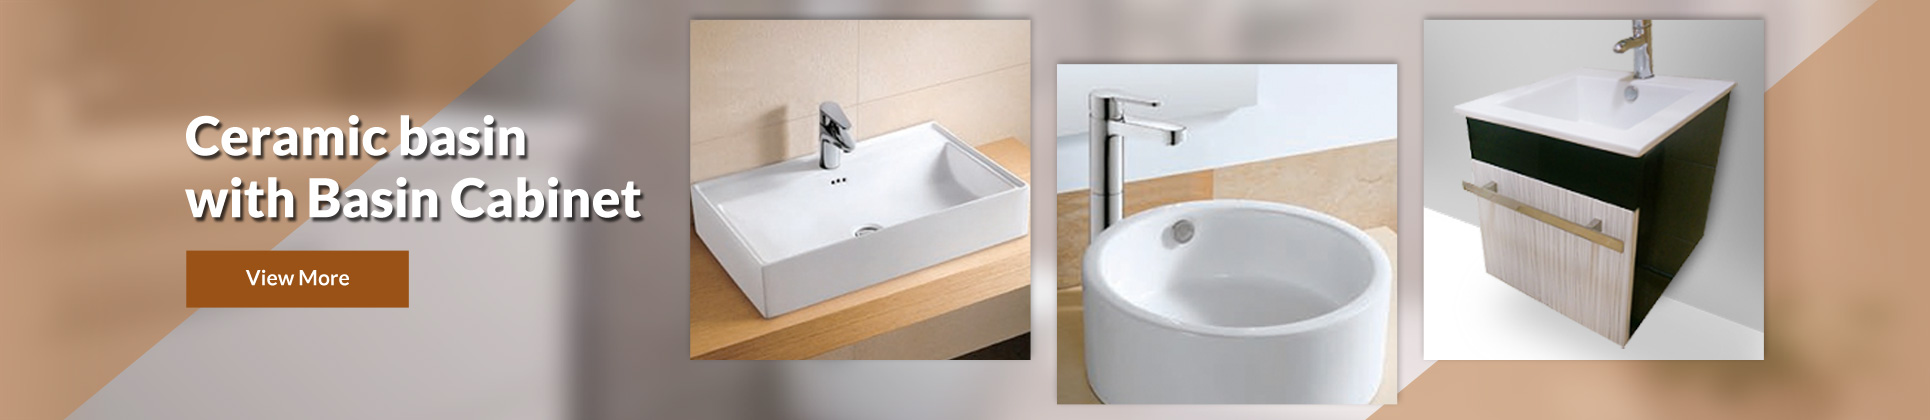 Ceramic basin with Basin Cabinet